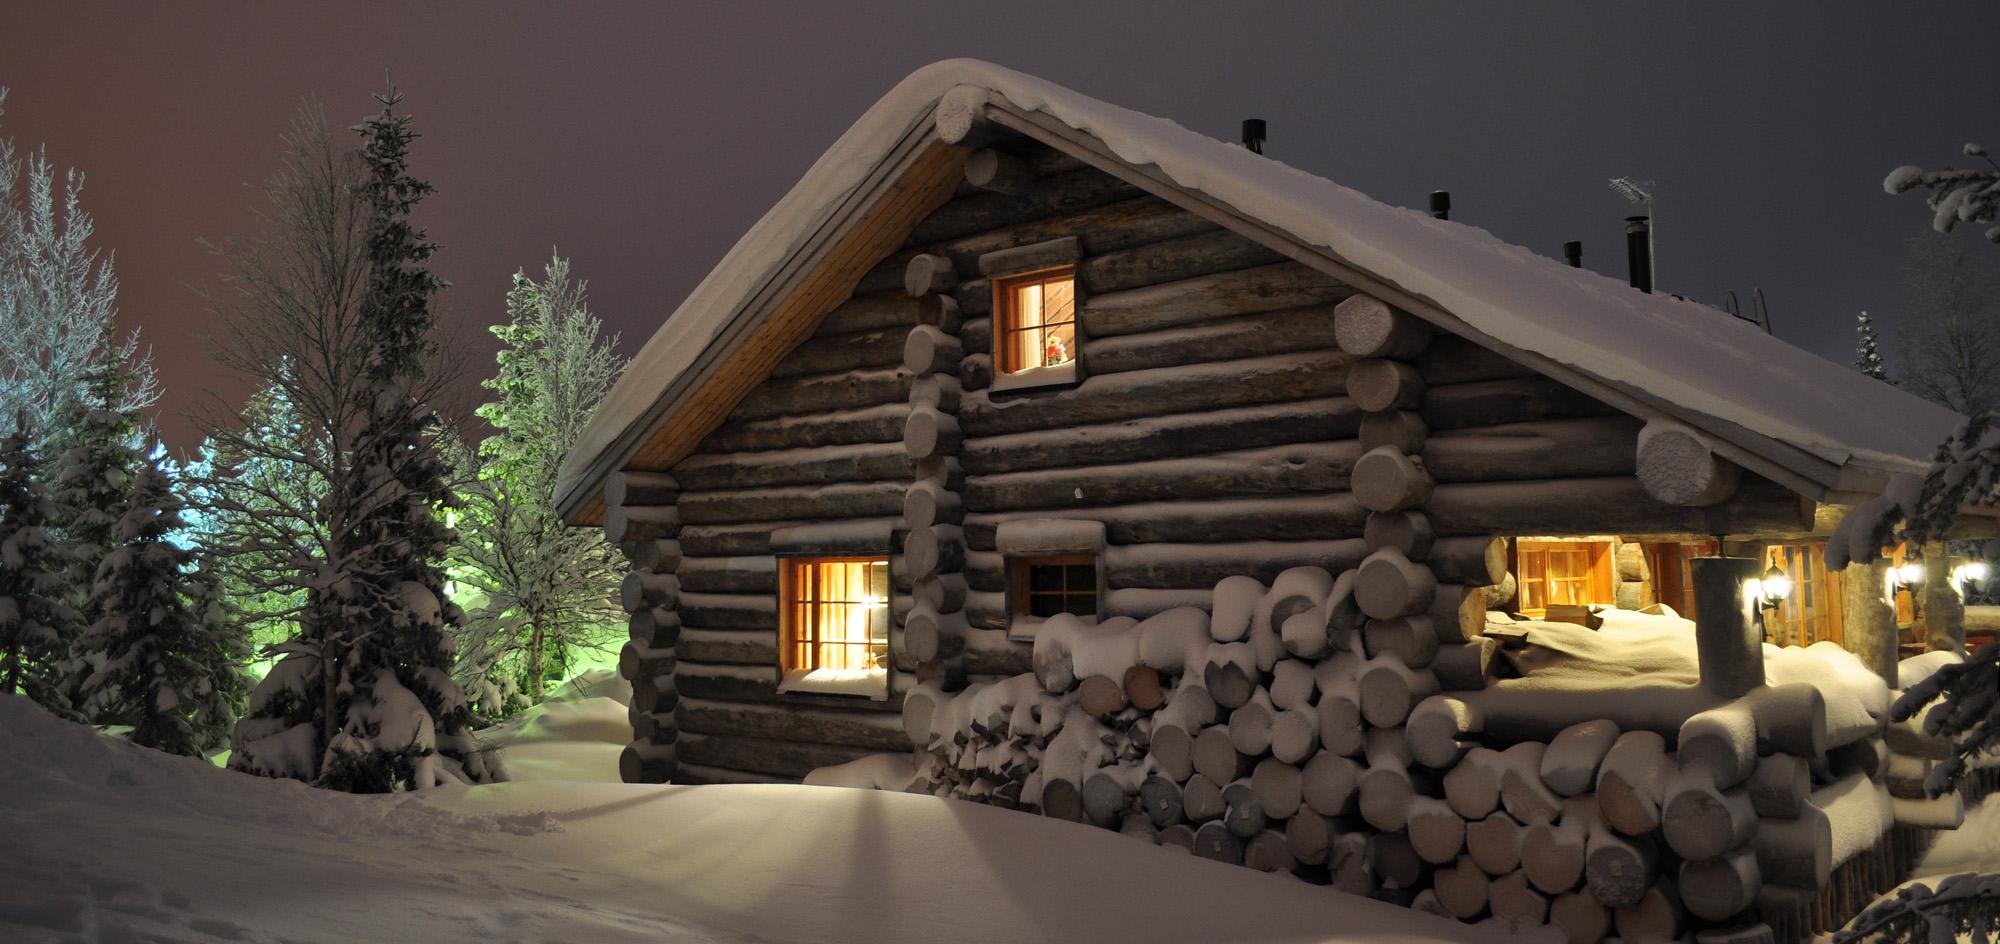 Blockhaus_winter.jpg